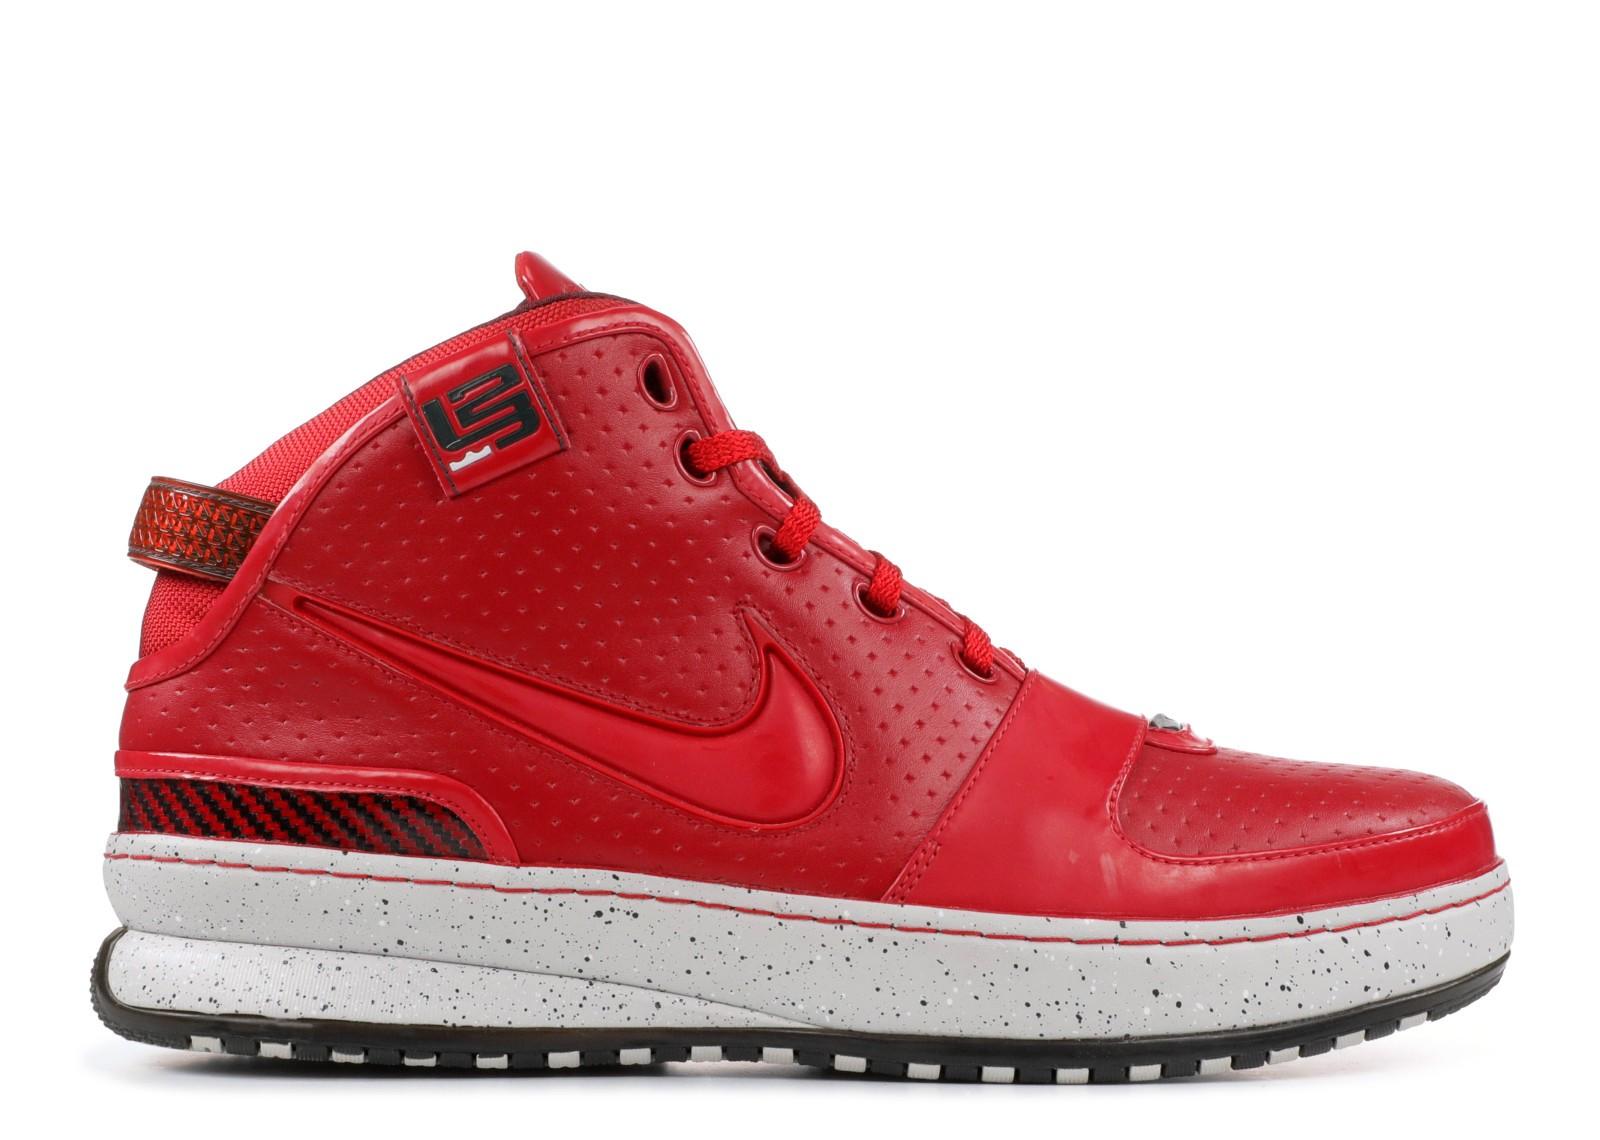 b1cfc76e113 Prev Zoom Lebron 6 Nyc Varsity Red Green Black Varsity Pink Red 346526-661.  Zoom